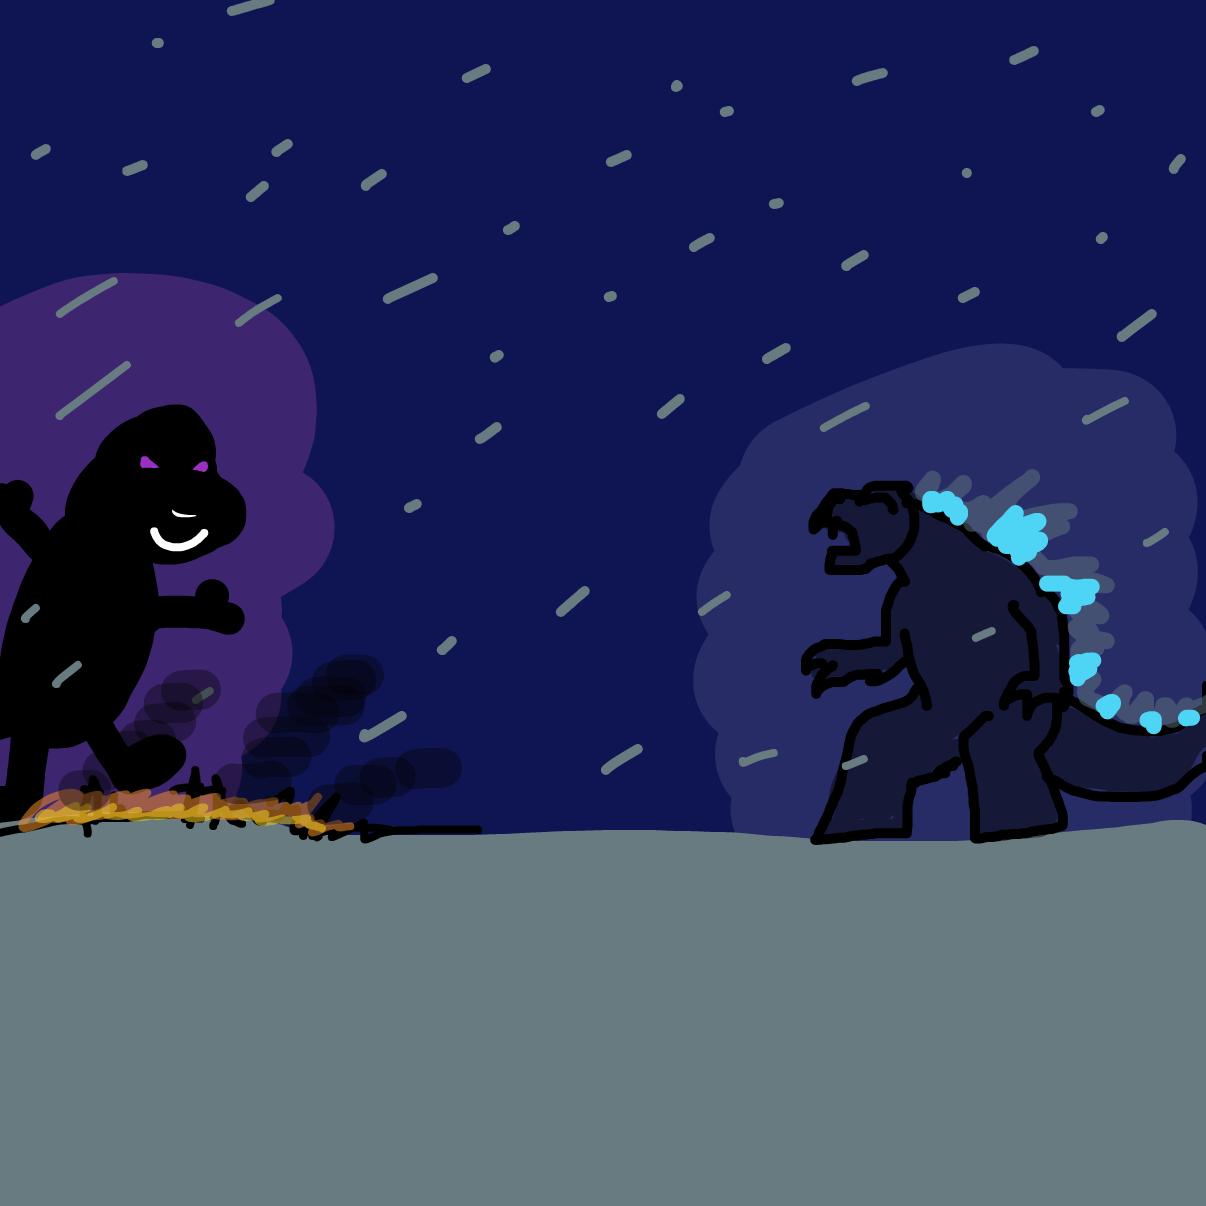 Drawing in Barney vs. Godzilla by bajira